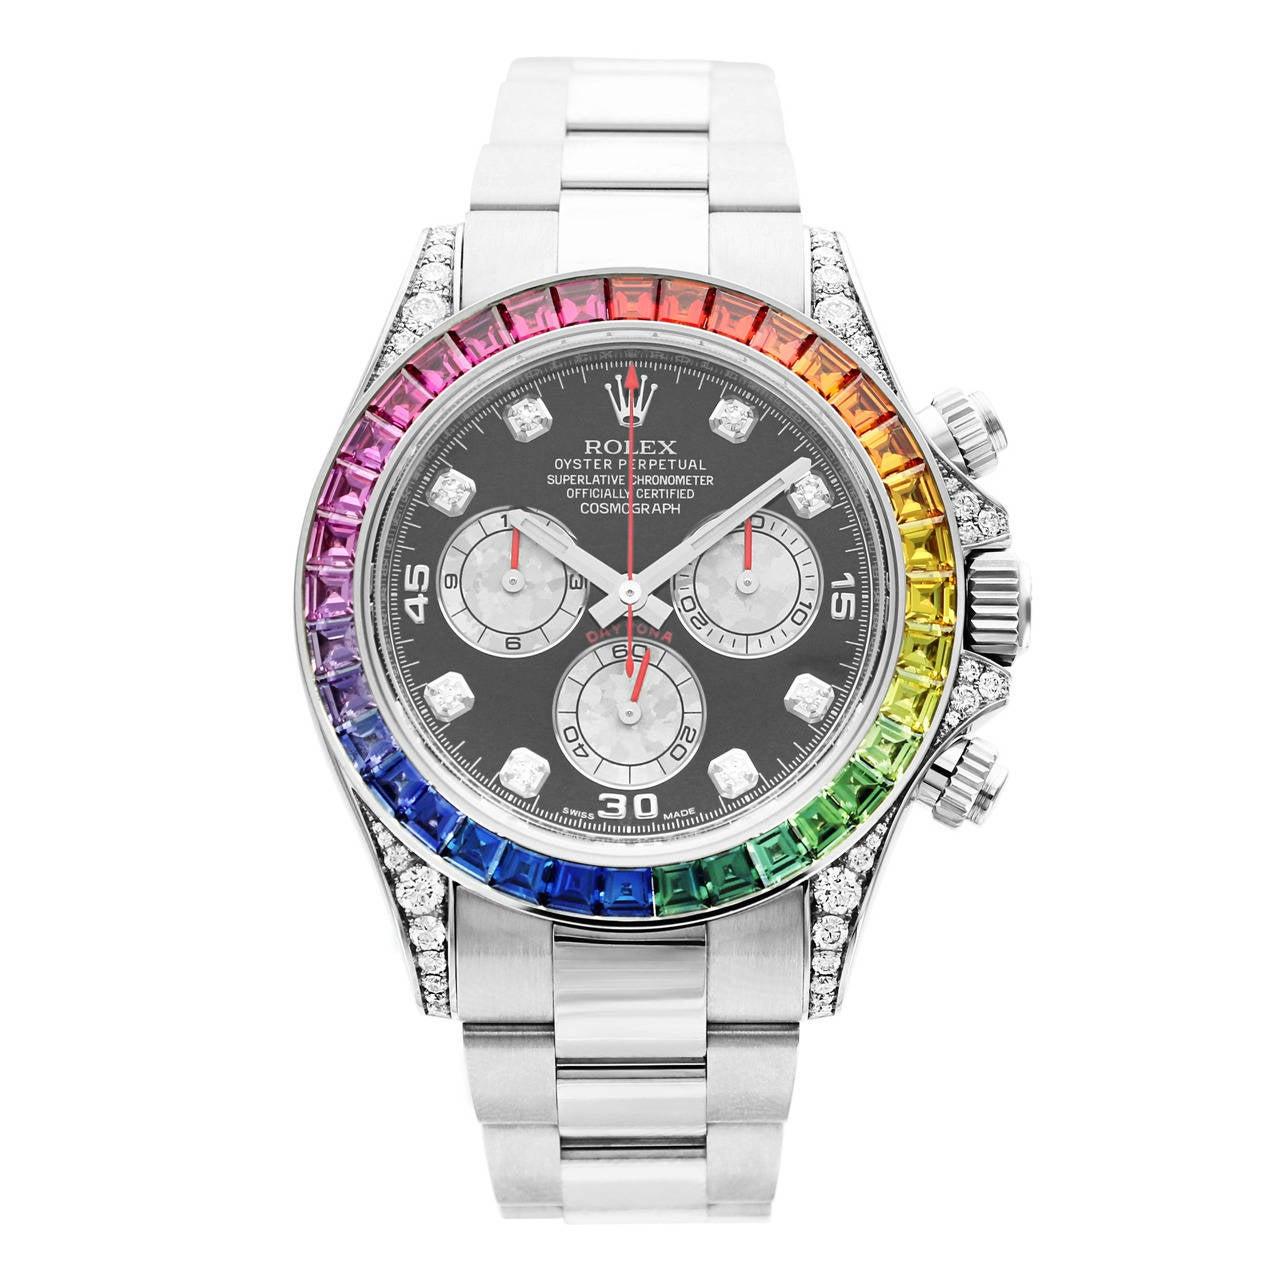 Rolex White Gold Daytona Rainbow Chronometer Wristwatch Ref 116599 1